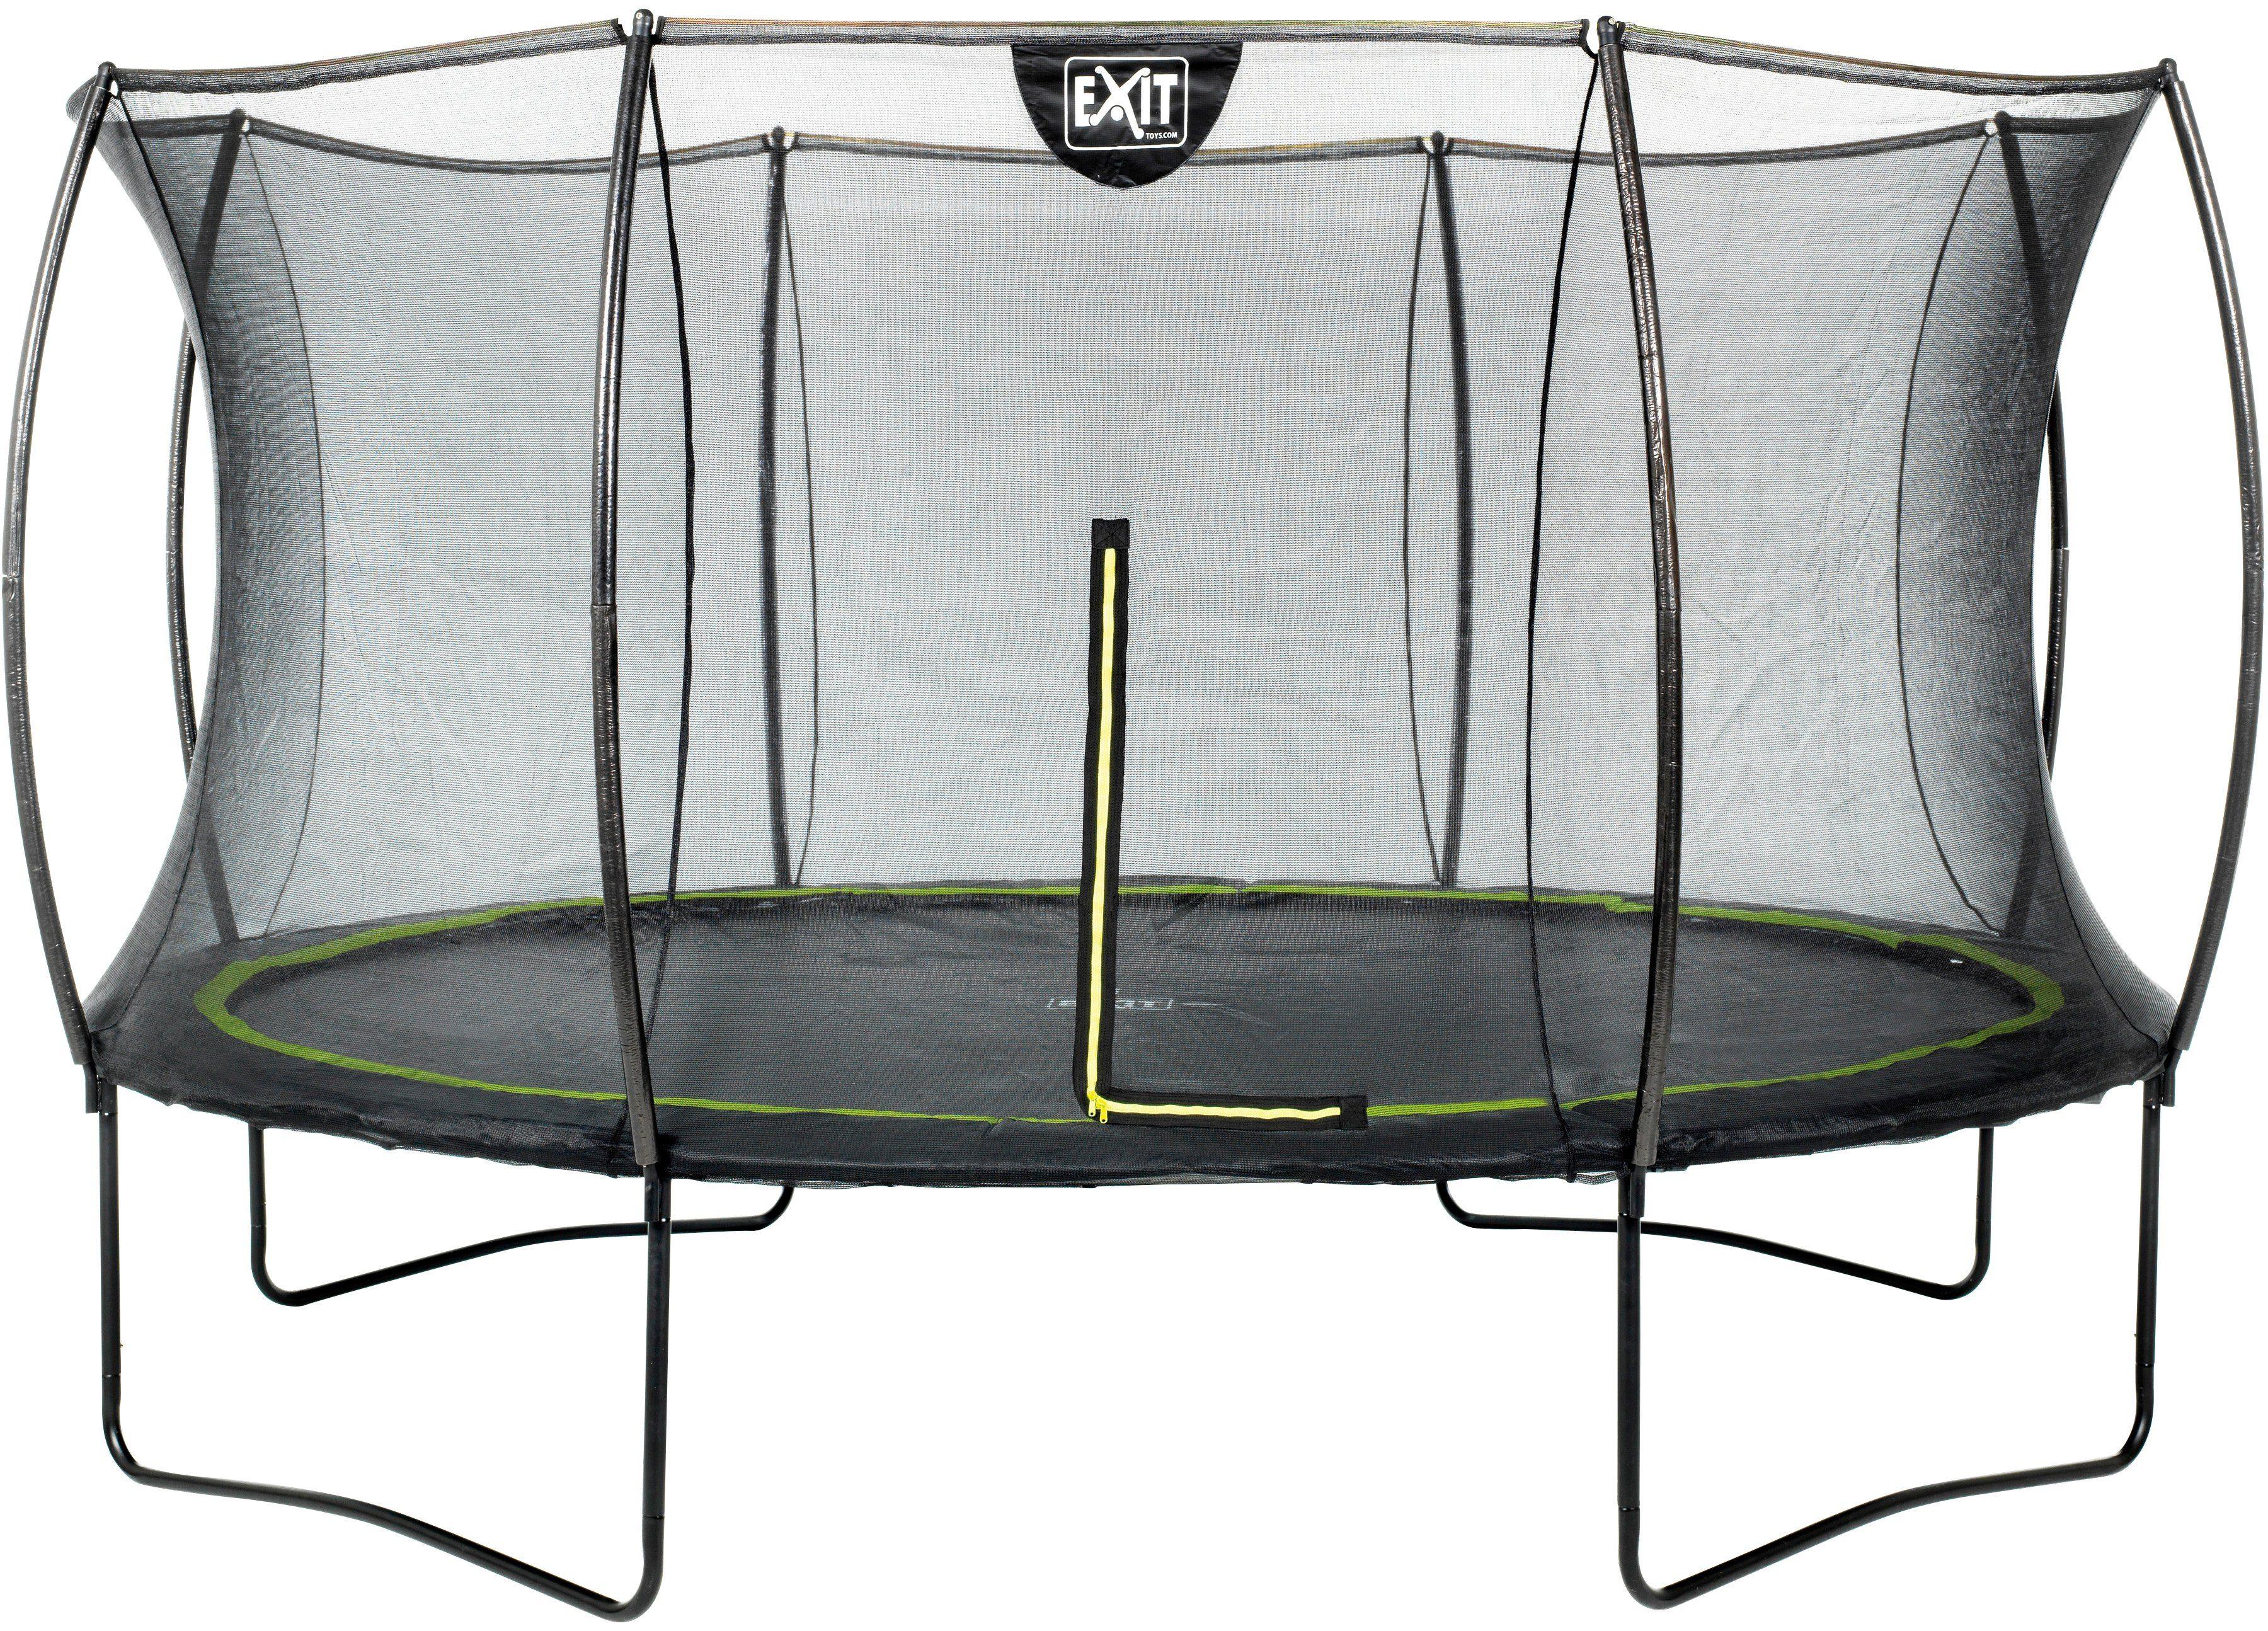 EXIT Trampolin »Silhouette«, Ø: 366 cm